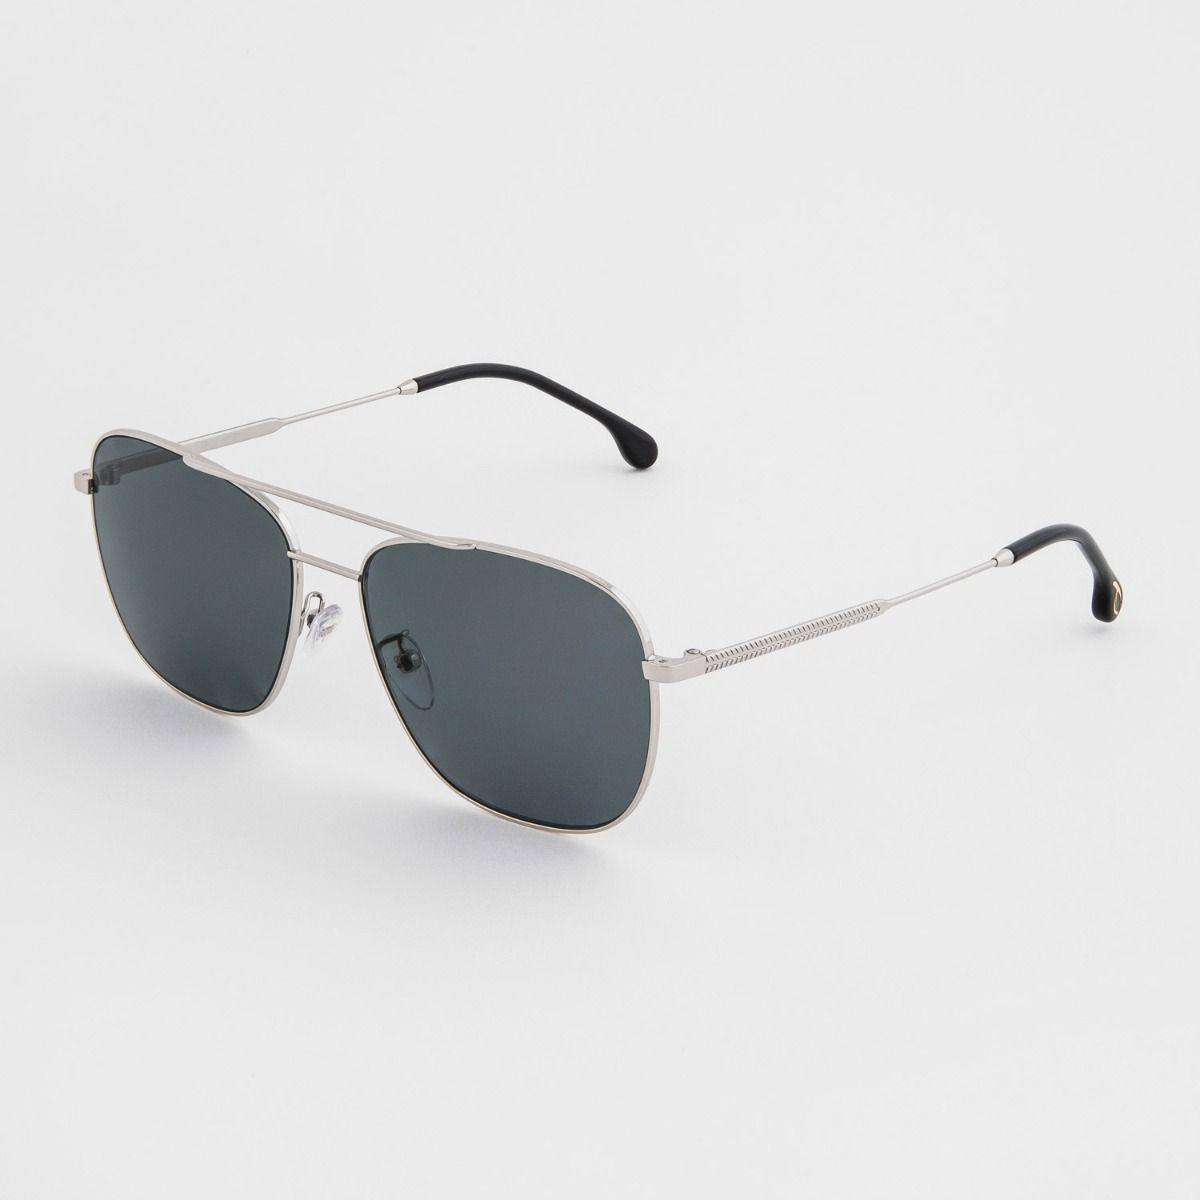 Paul Smith Avery Aviator Sunglasses